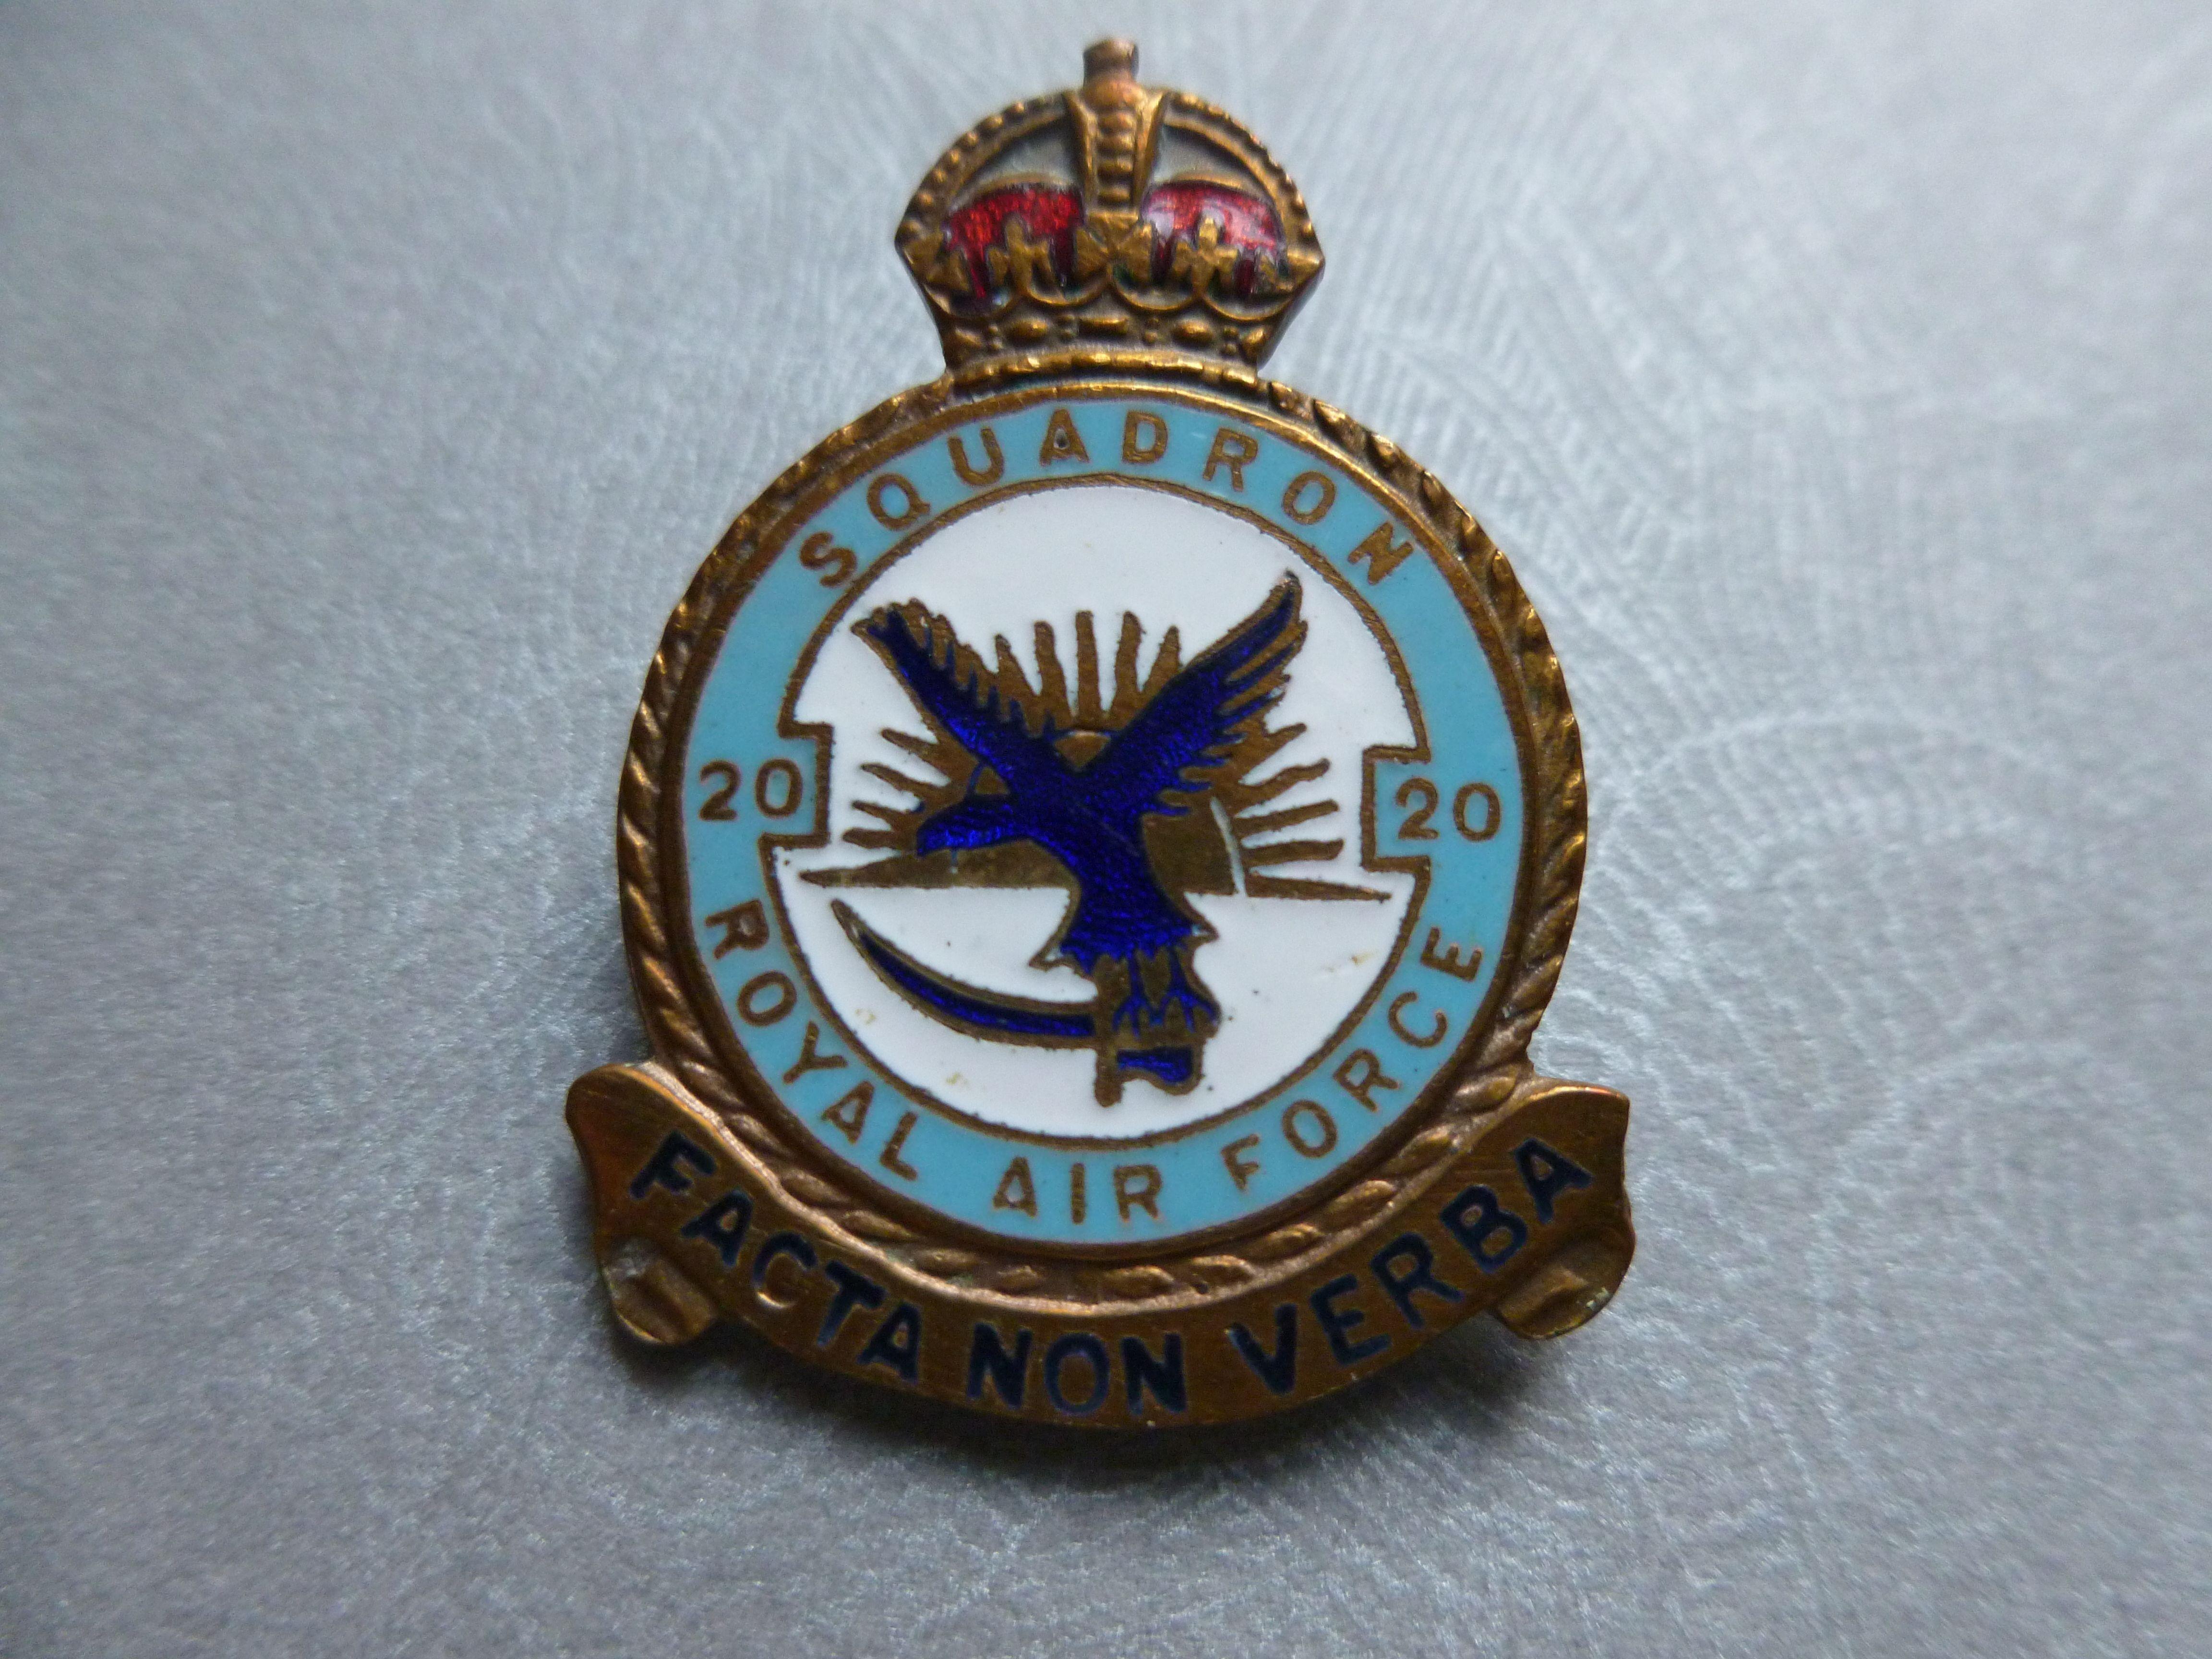 RAF 20 20 Squadron Vintage enamel and gilt badge Air